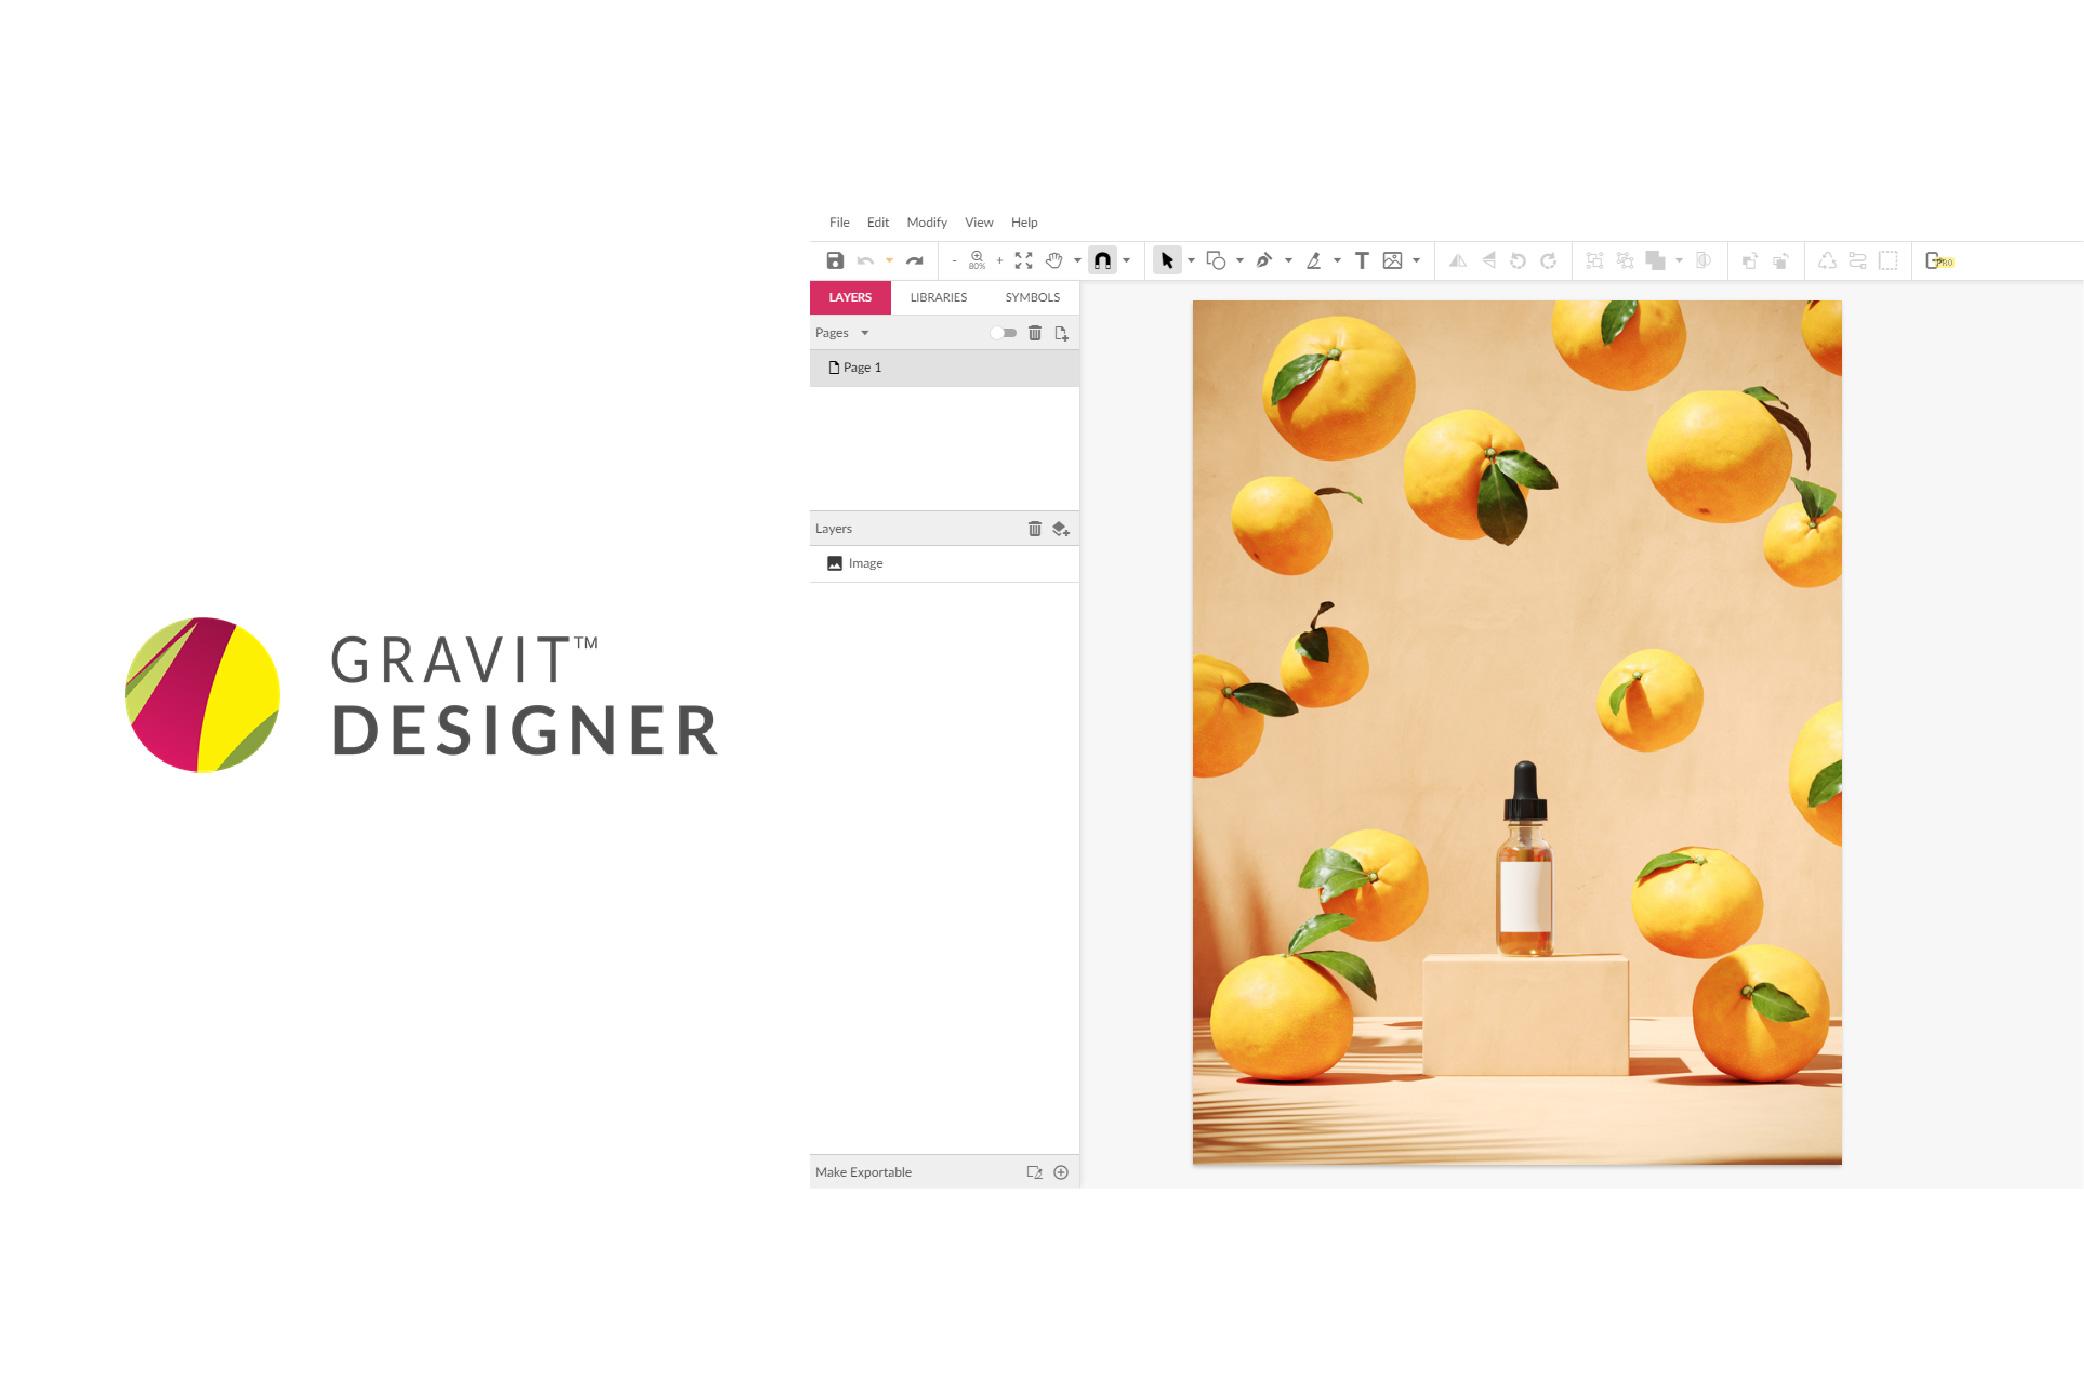 UI of Gravit-Designer software